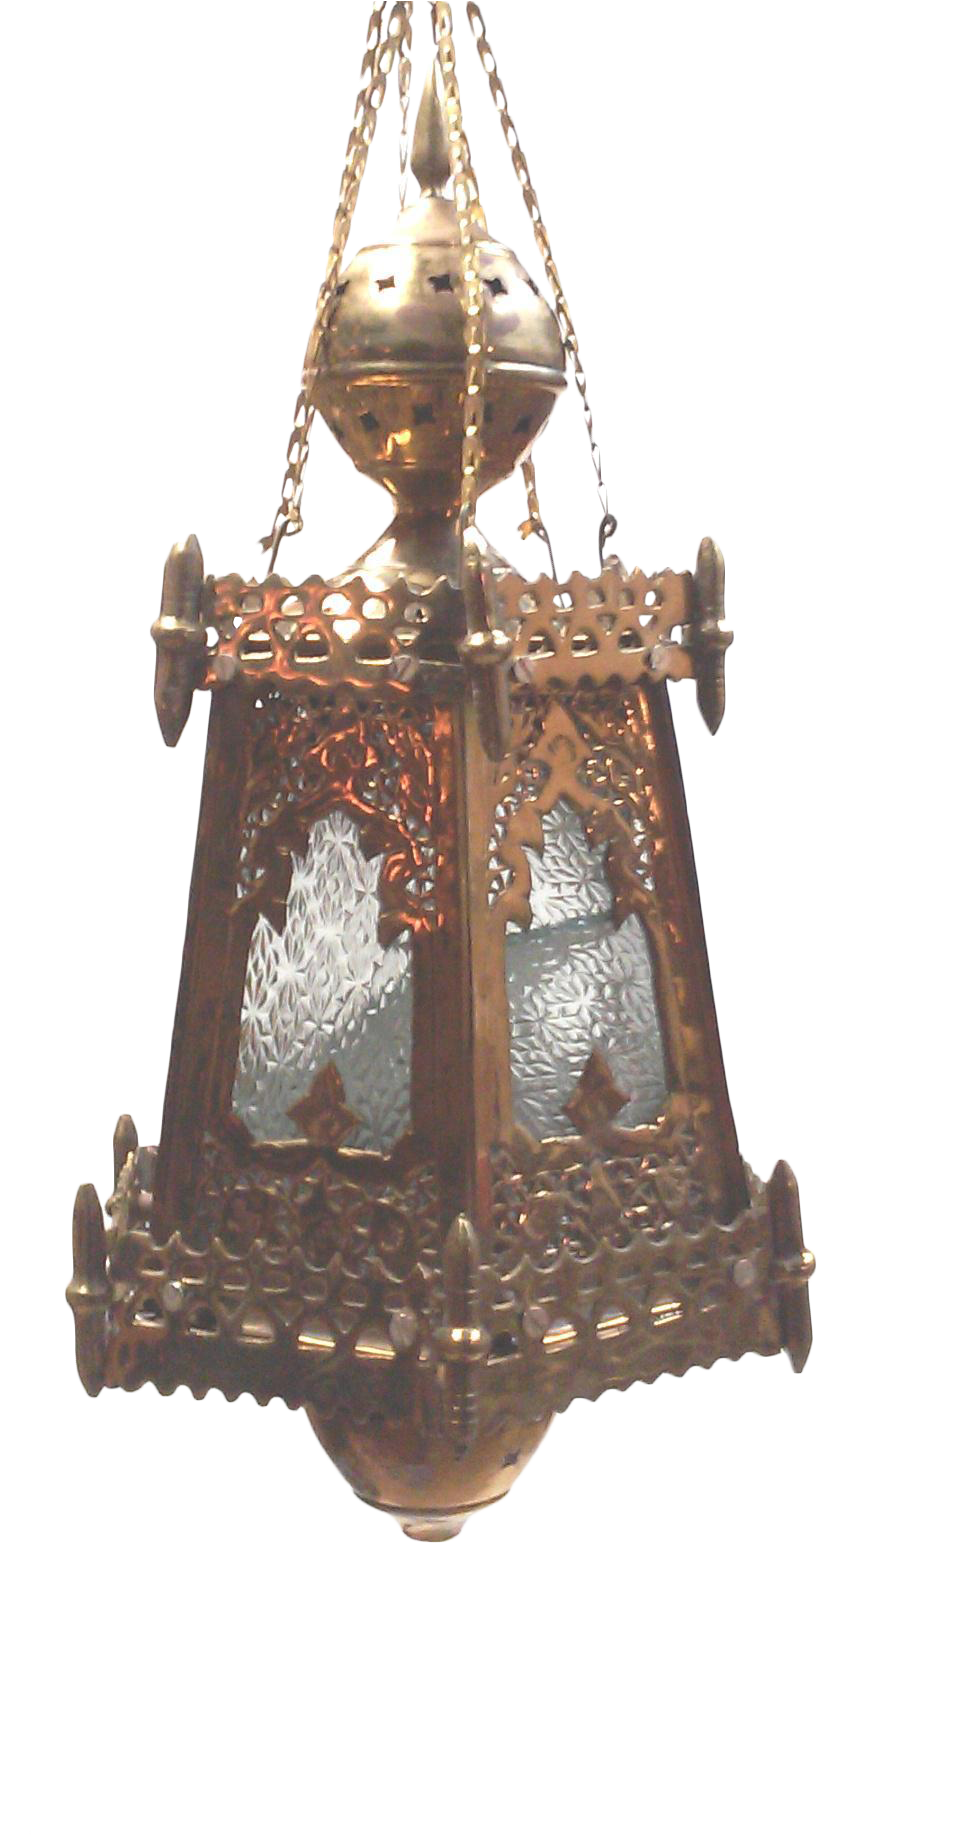 Solid Brass Hanging Decorative Moroccan Lantern